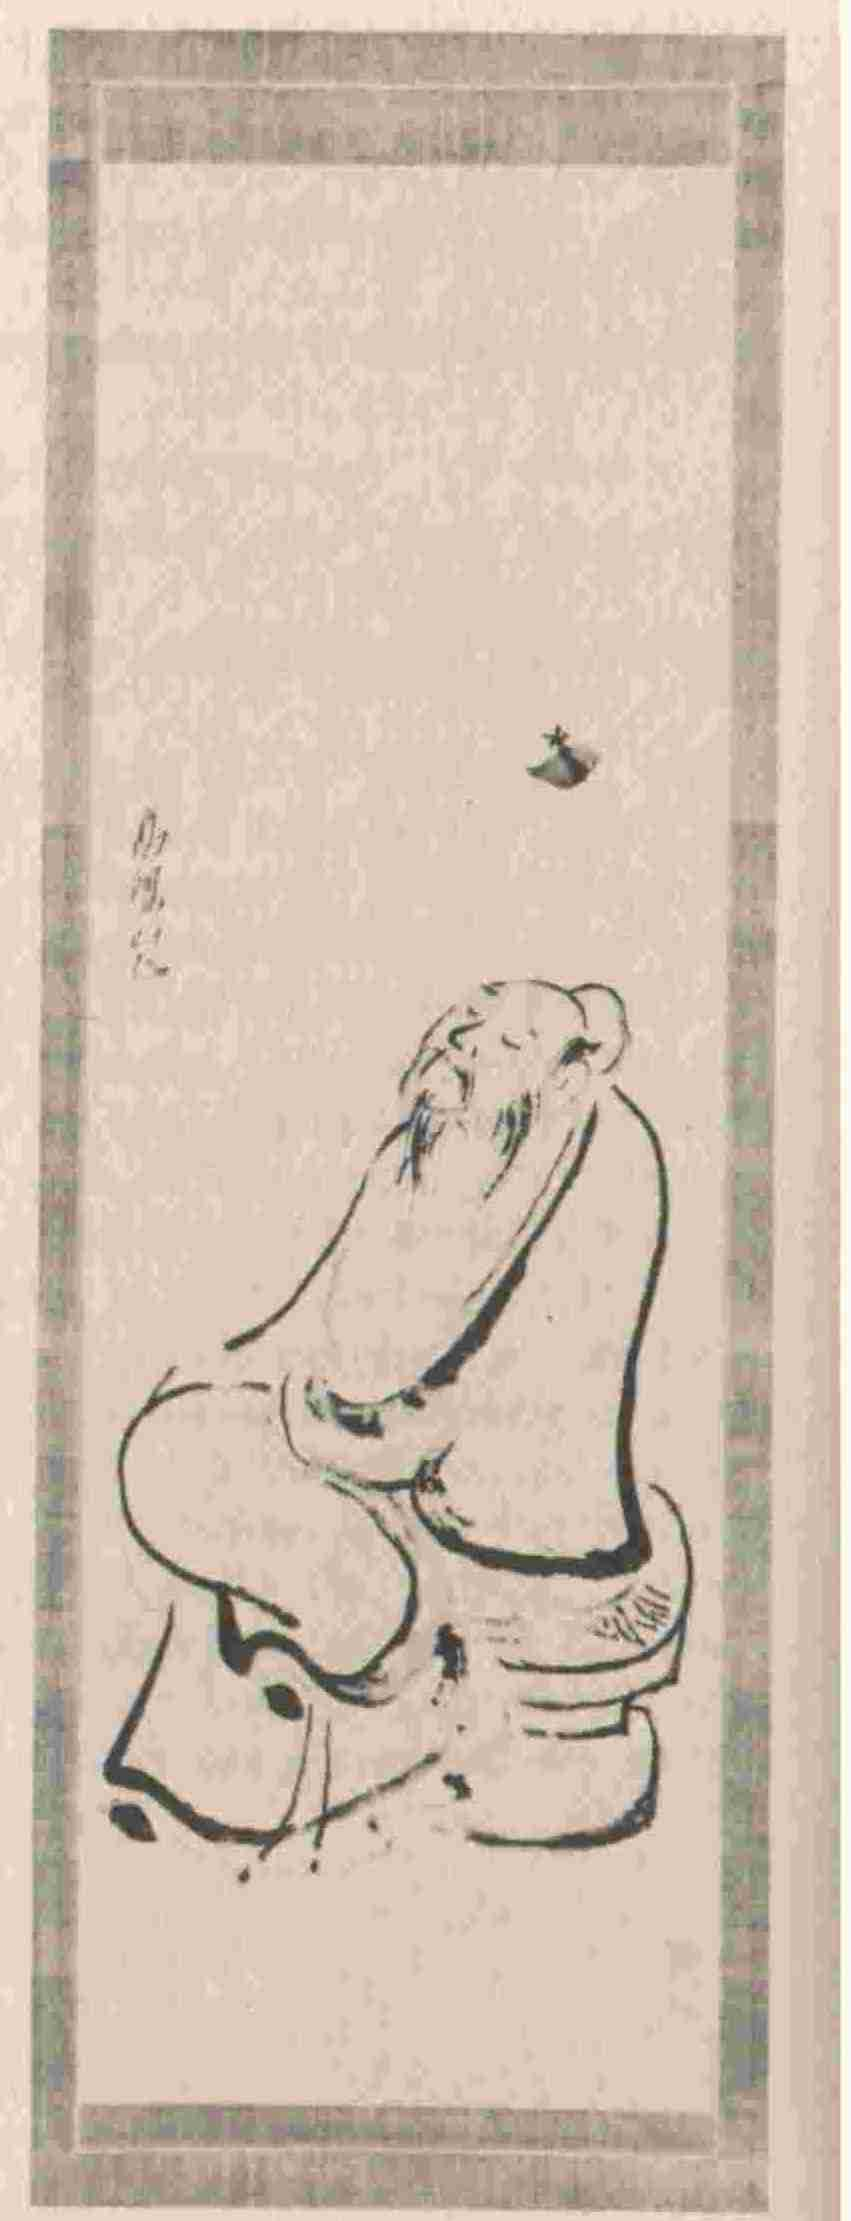 Dschuang Dse <br/>der Schmetterlingstraum